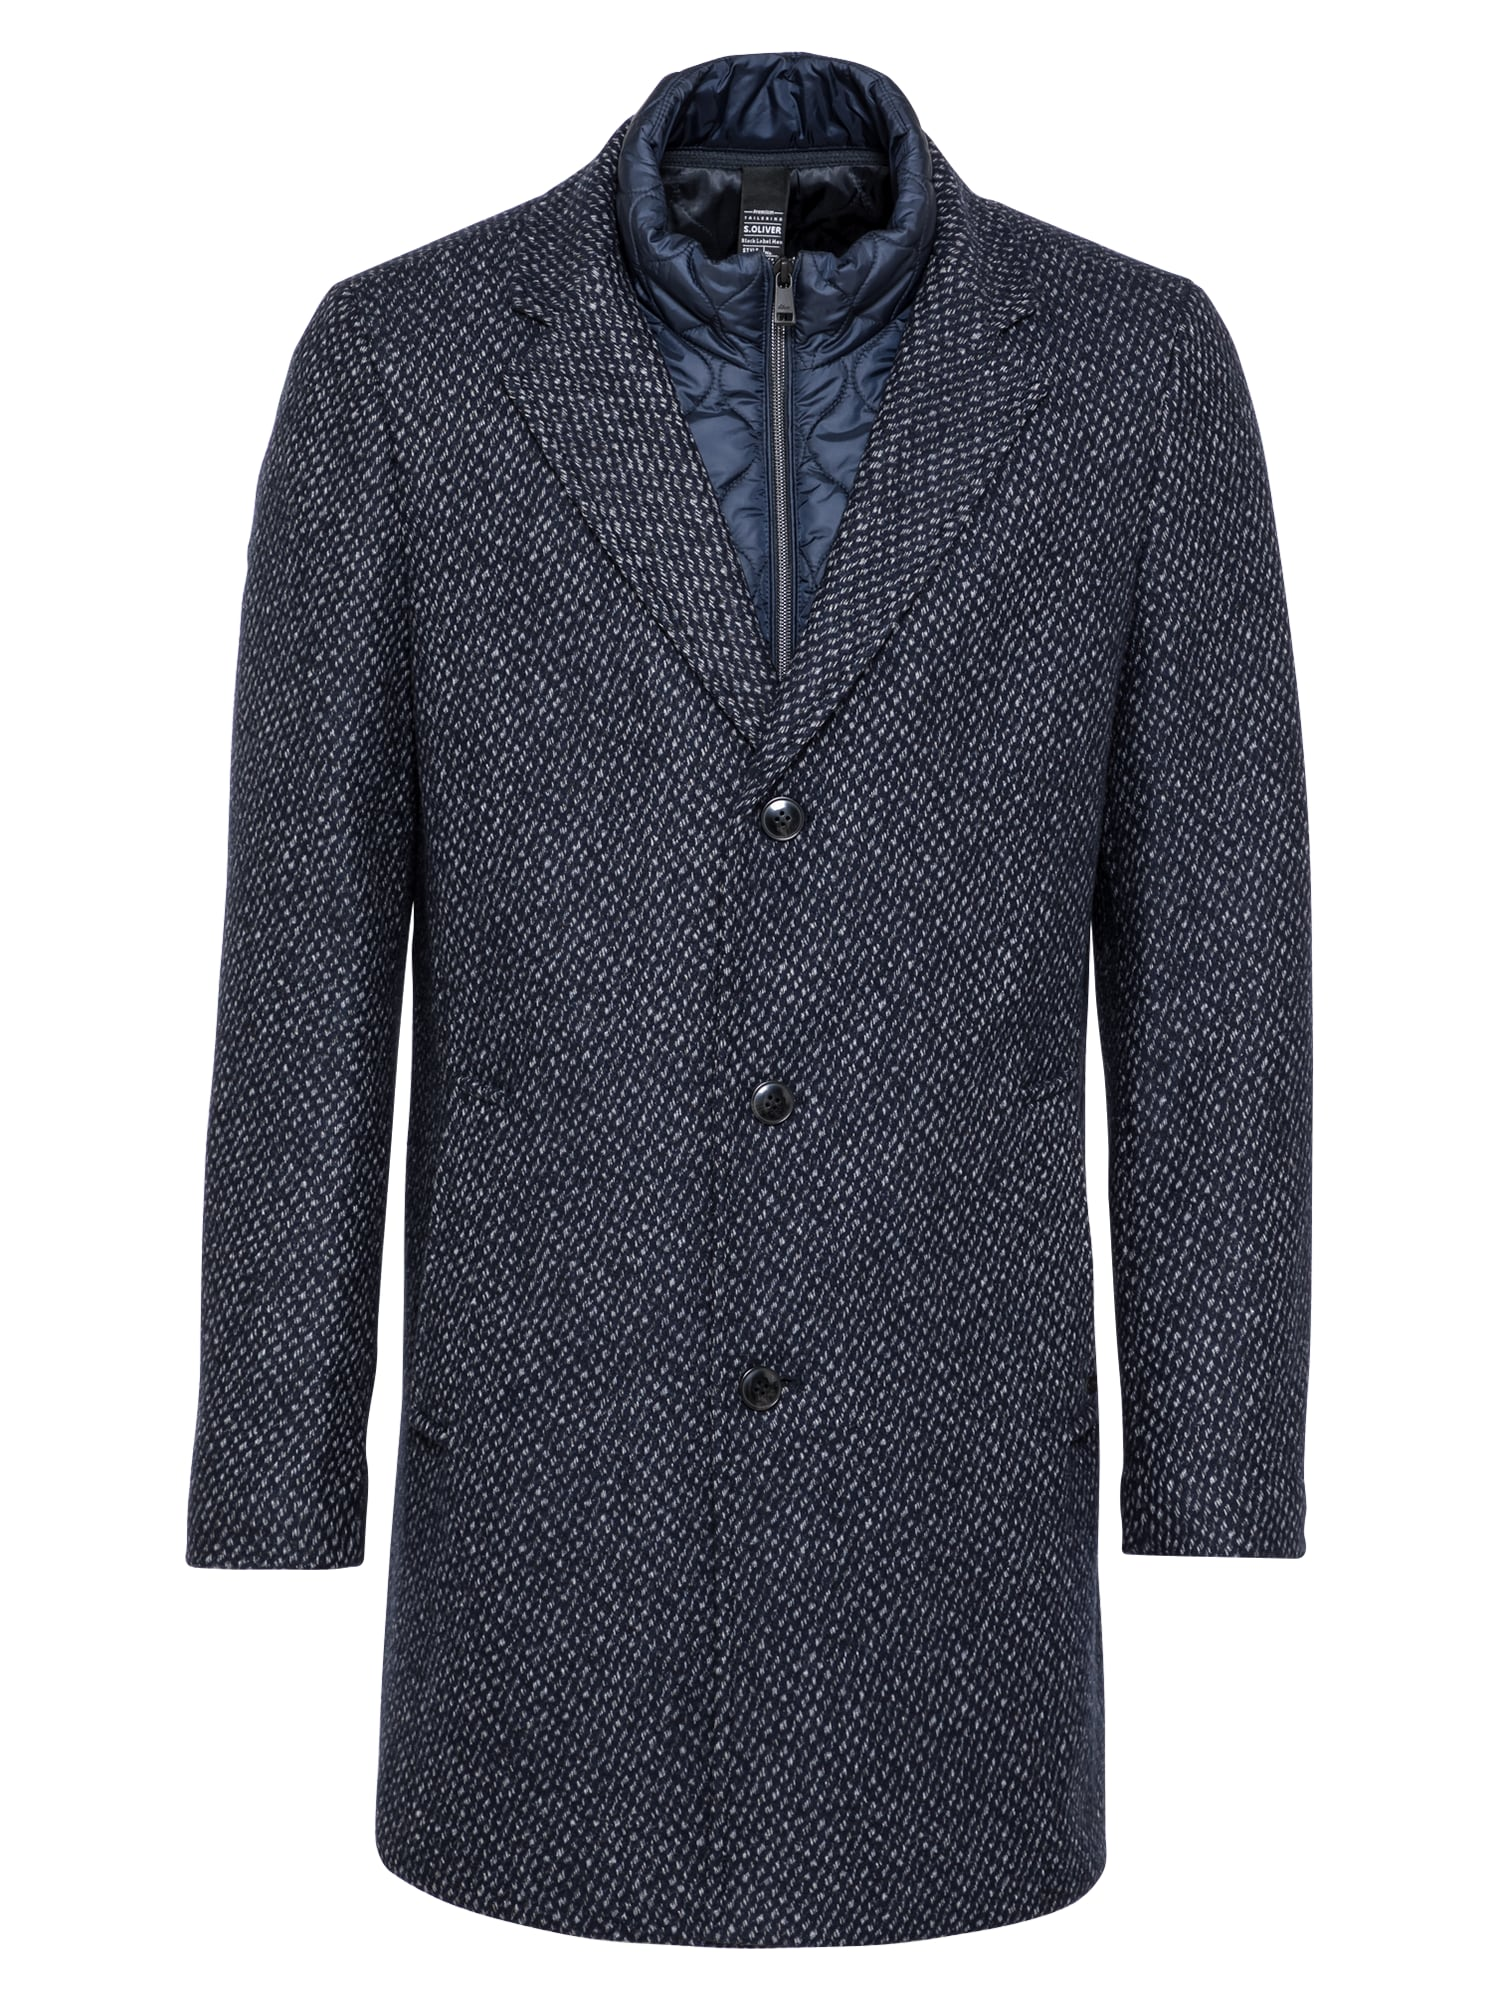 s.Oliver BLACK LABEL Demisezoninis paltas tamsiai mėlyna